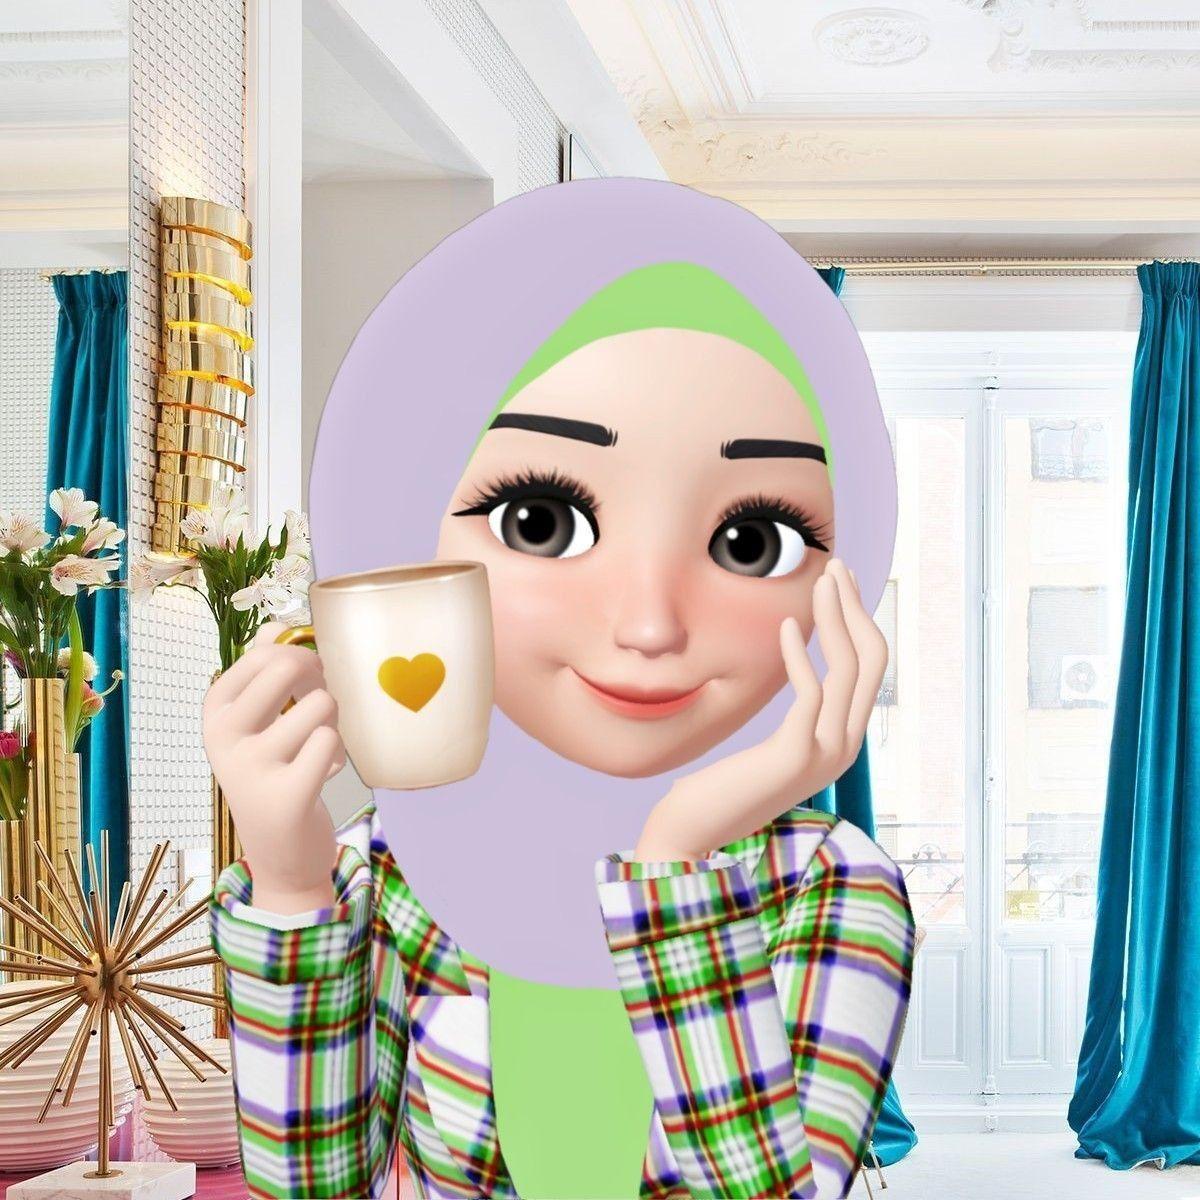 Pin Oleh バン ビ Di Hijab Girls Animation Seni Islamis Ilustrasi Kartun Kartun